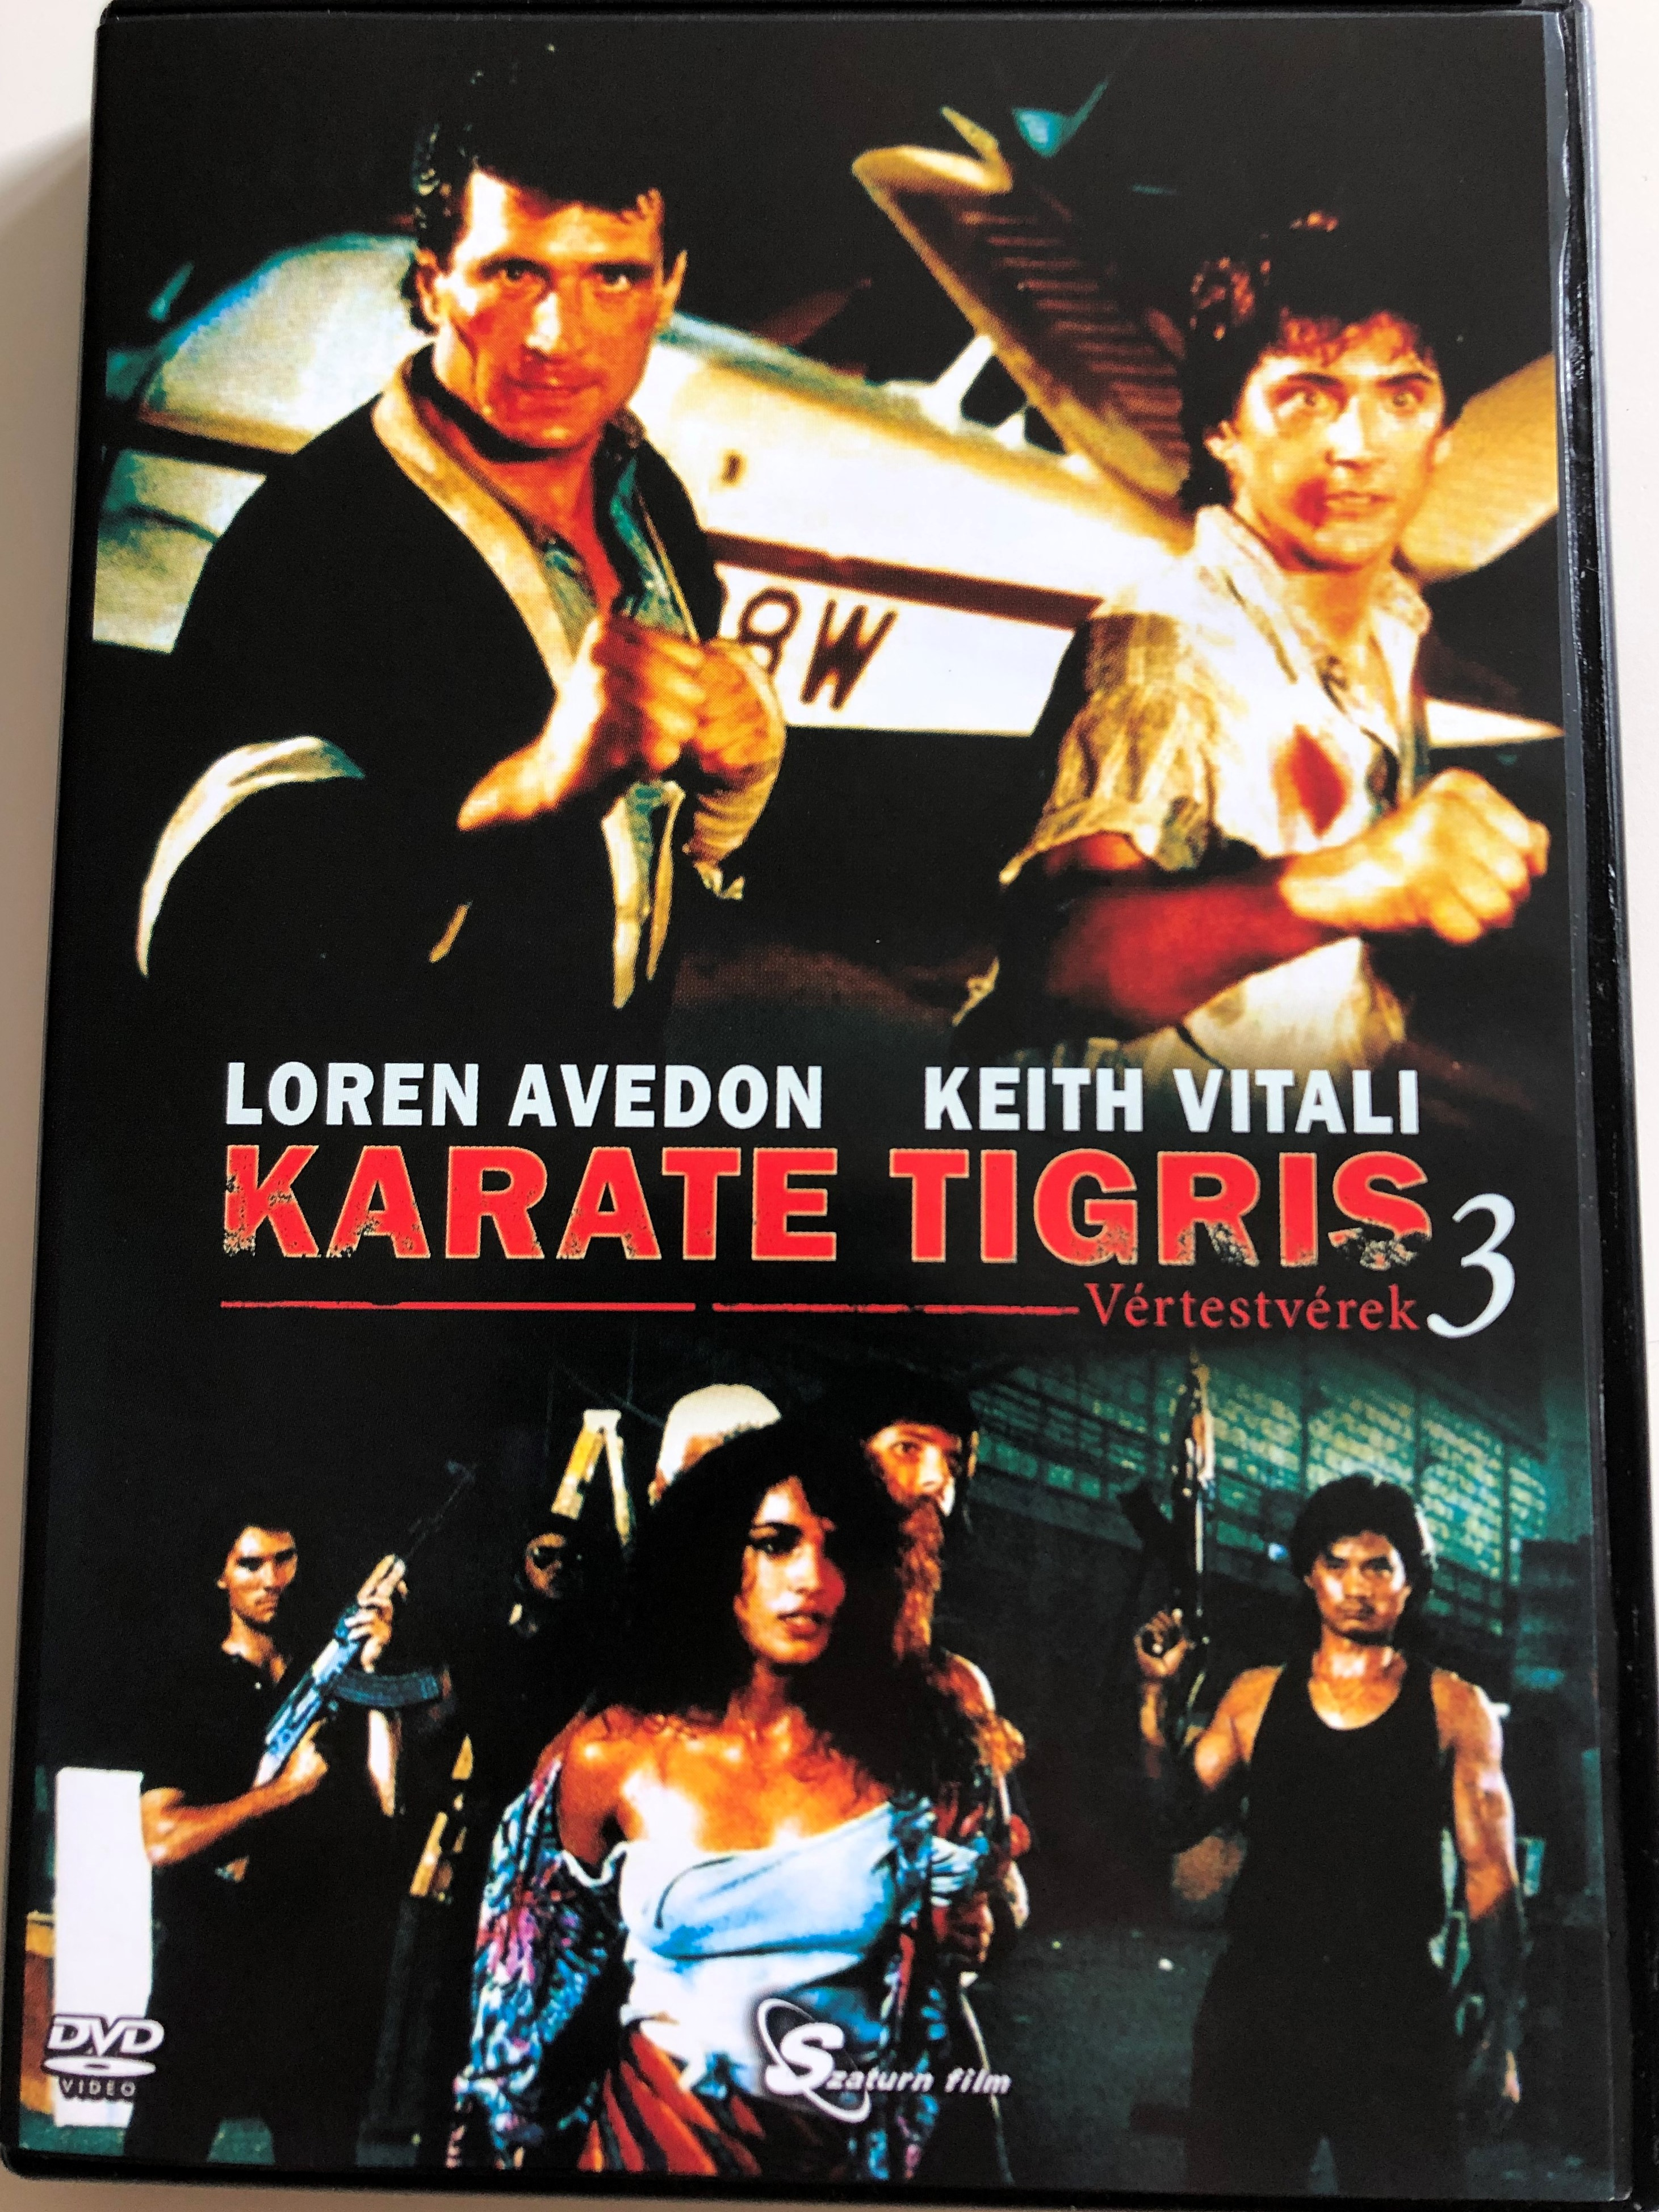 no-retreat-no-surrender-3-blood-brothers-dvd-1990-karate-tigris-3-v-rtestv-rek-directed-by-lucas-lowe-starring-loren-avedon-keith-vitali-1-.jpg